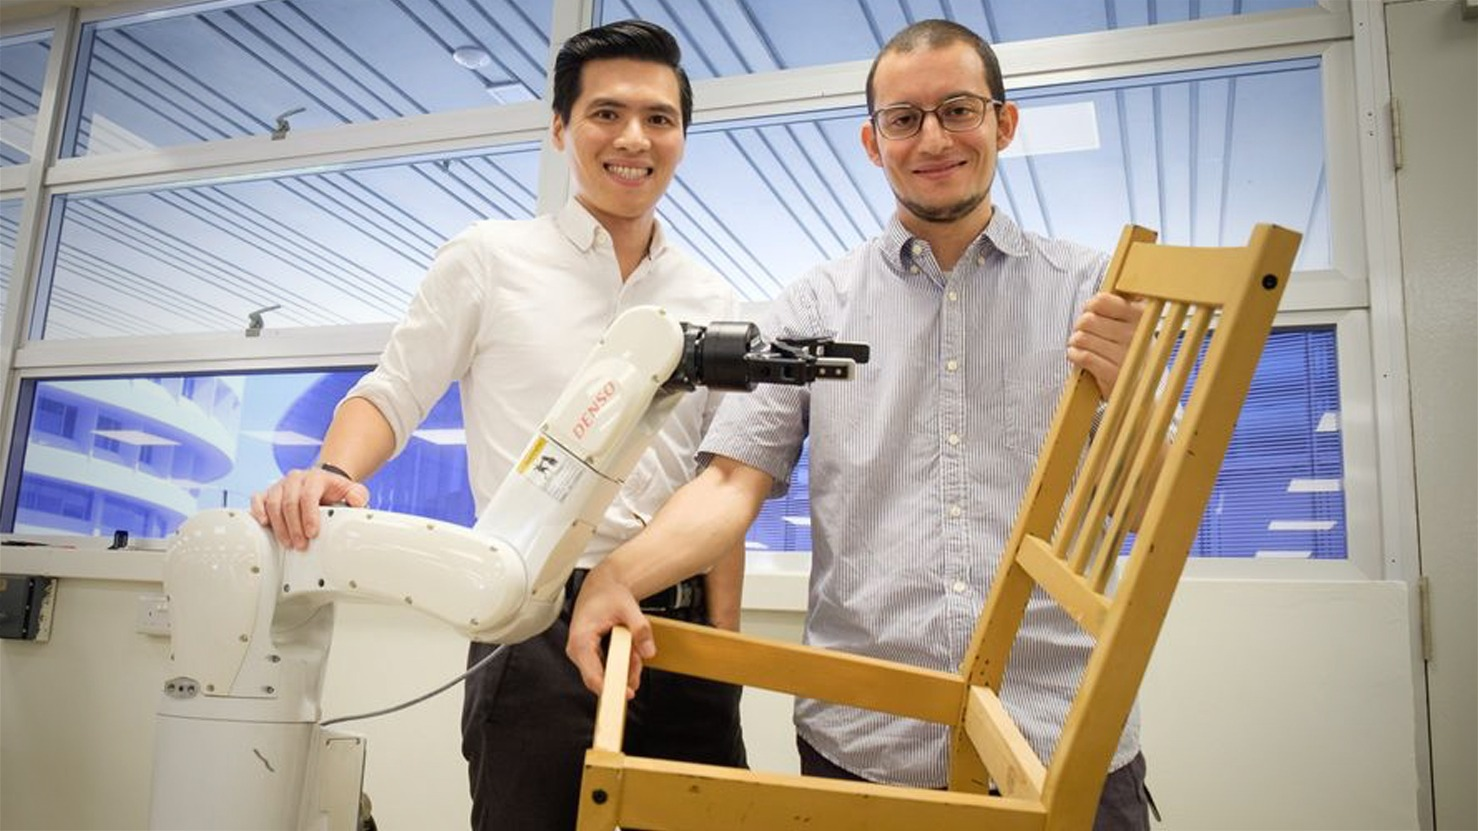 Autonomous Robot Intelligence Now Tested With Ikea